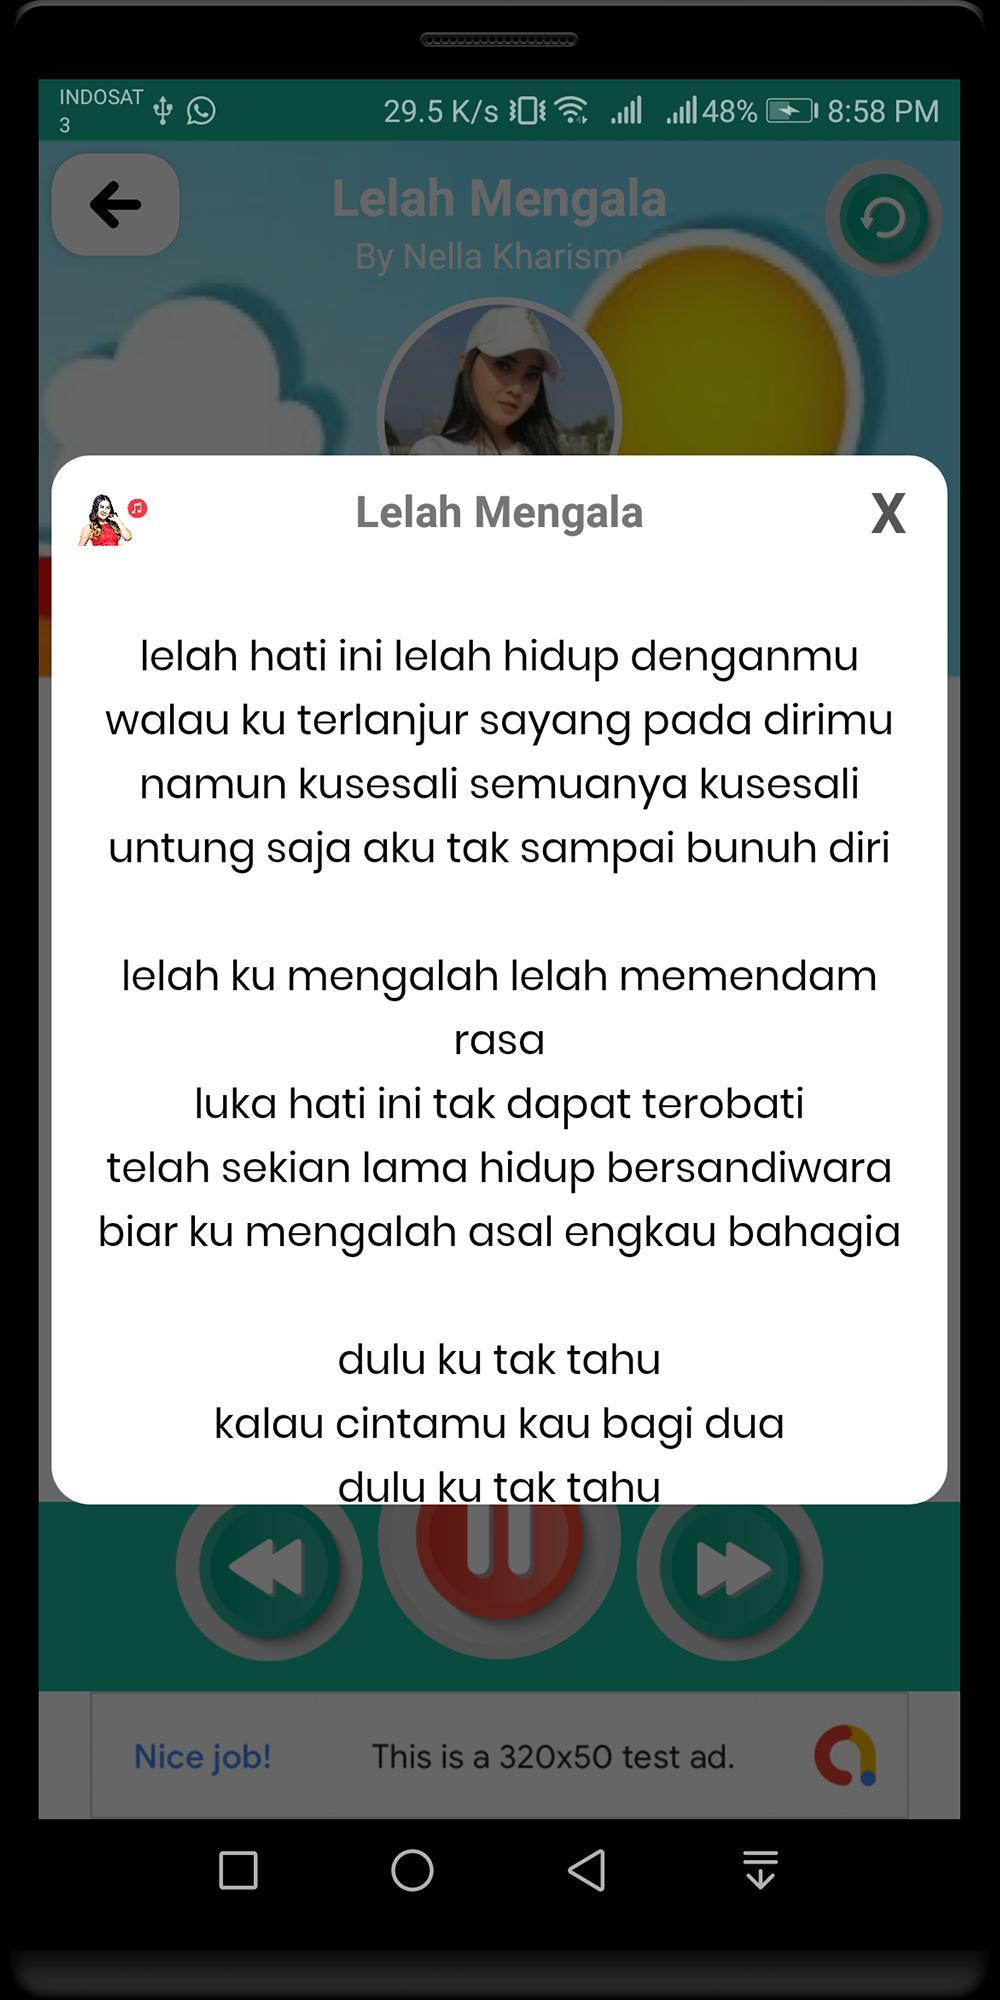 Lagu Nella Kharisma Lelah Mengalah Lirik For Android